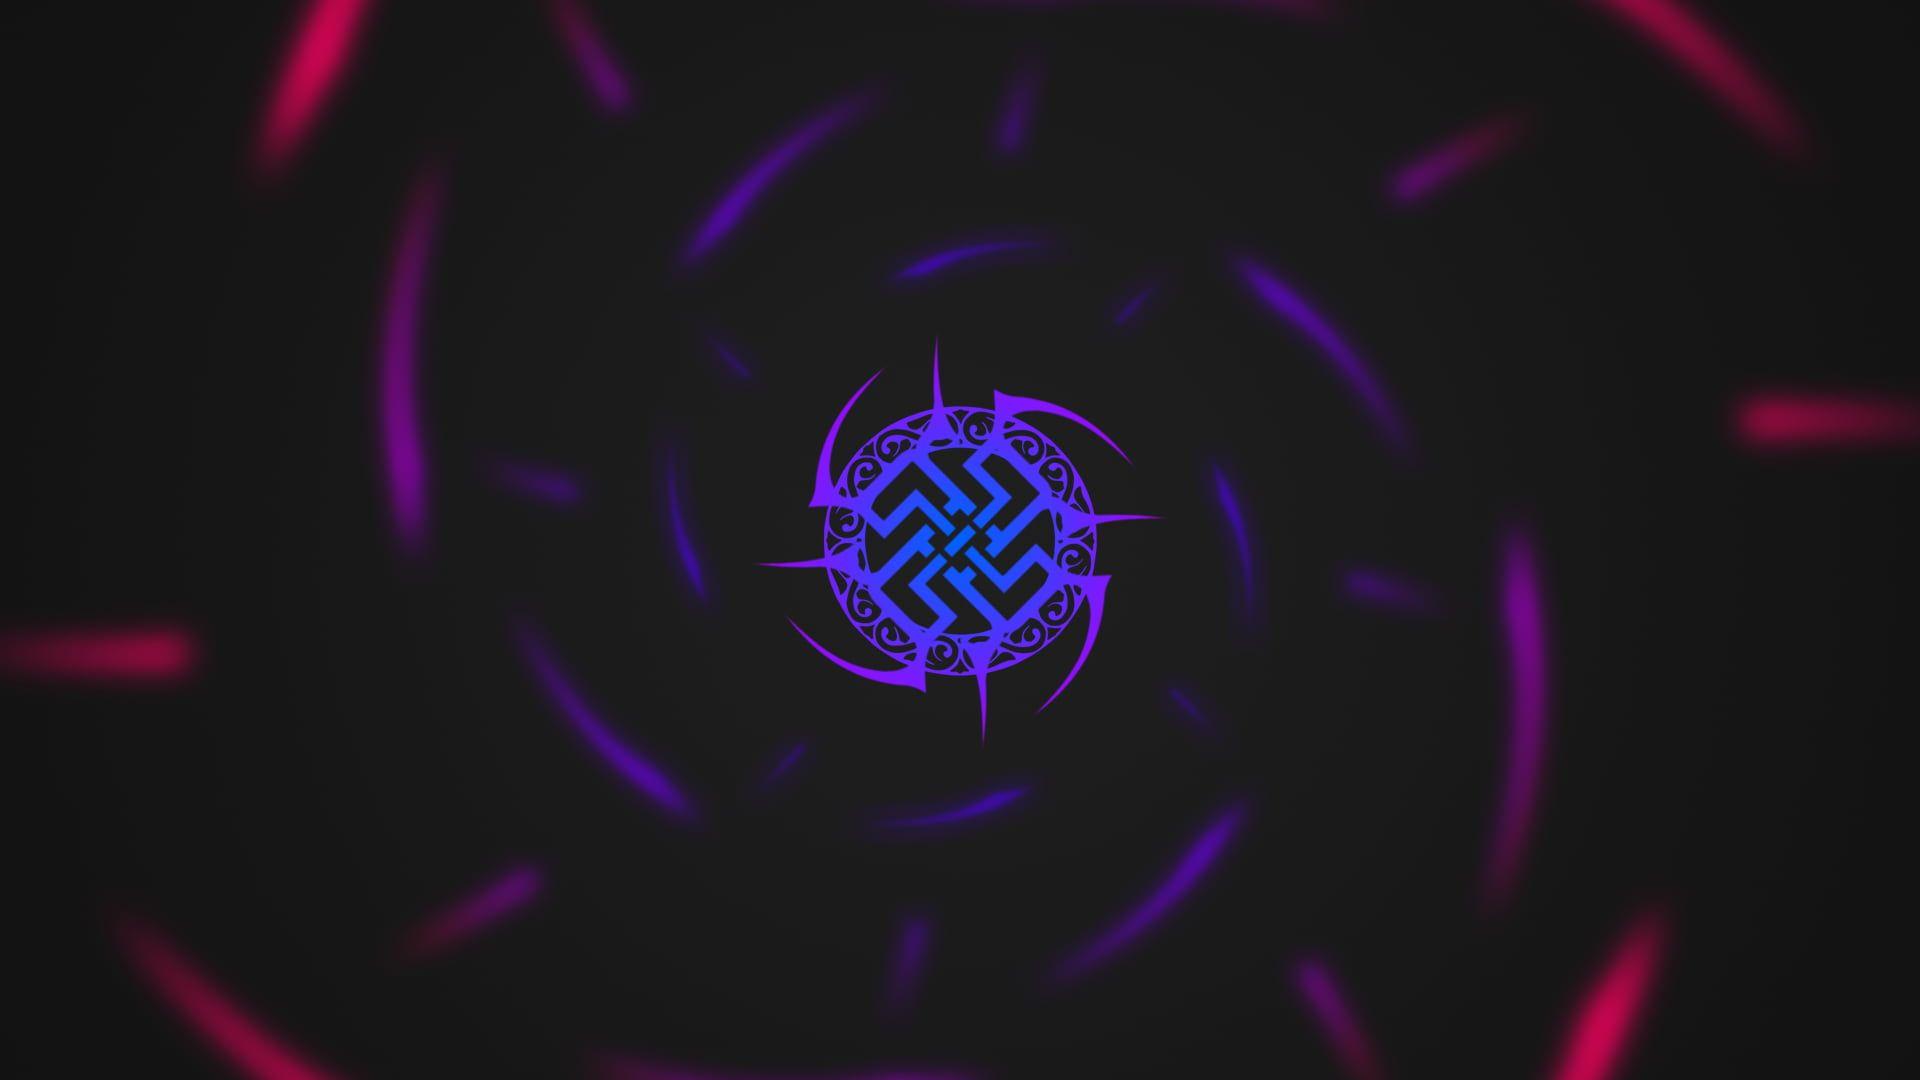 Tribal Logo Wallpaper Minimalism Black Colorful Tribal 1080p